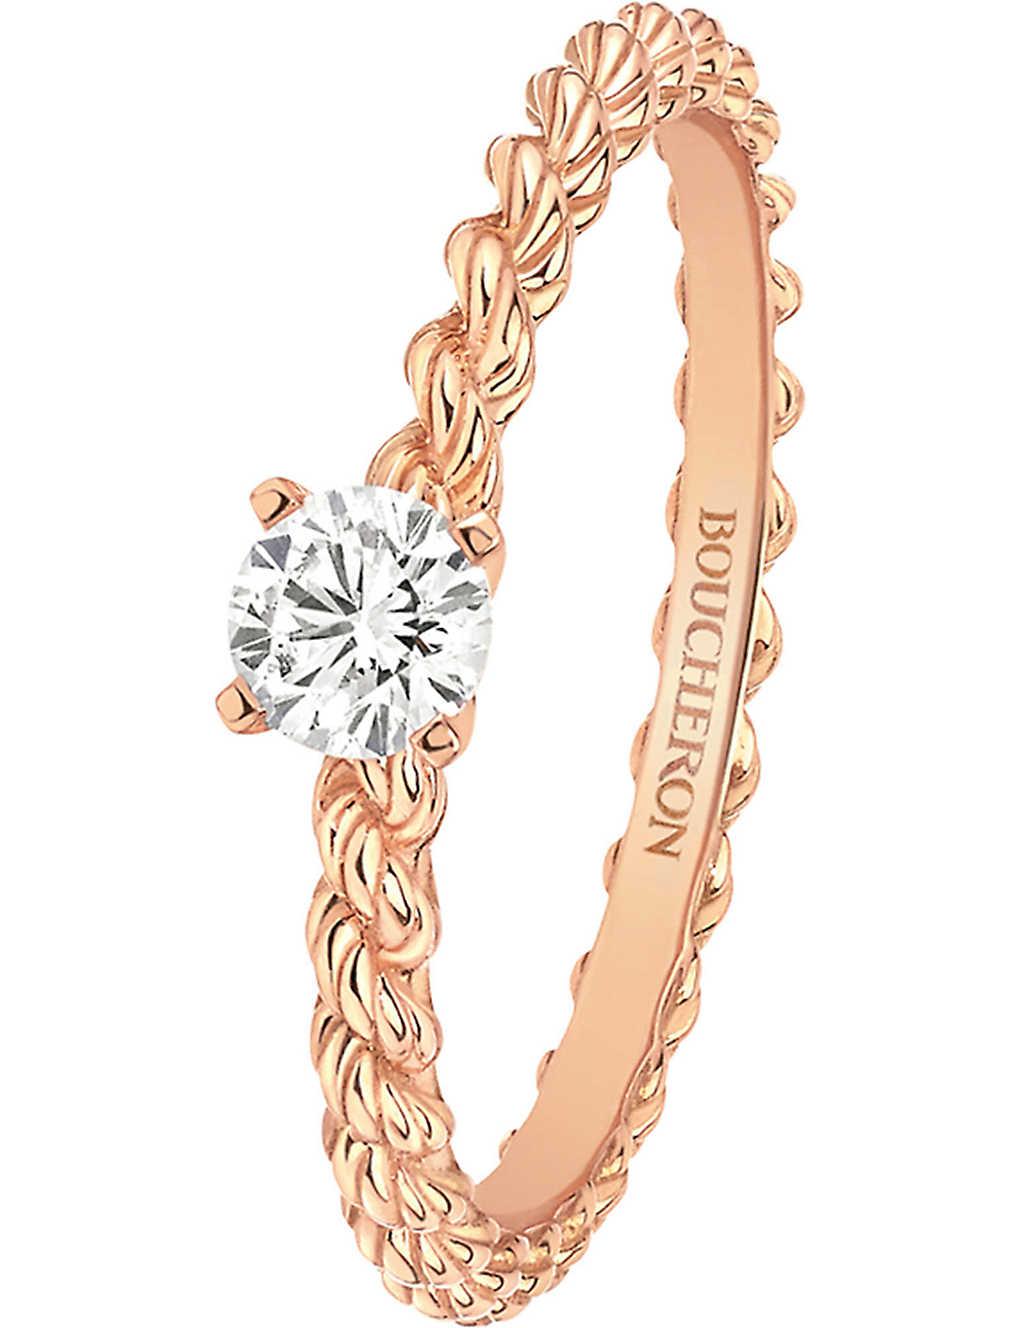 grand choix de c0610 227fb Serpent Bohème 18ct pink-gold and solitaire diamond ring